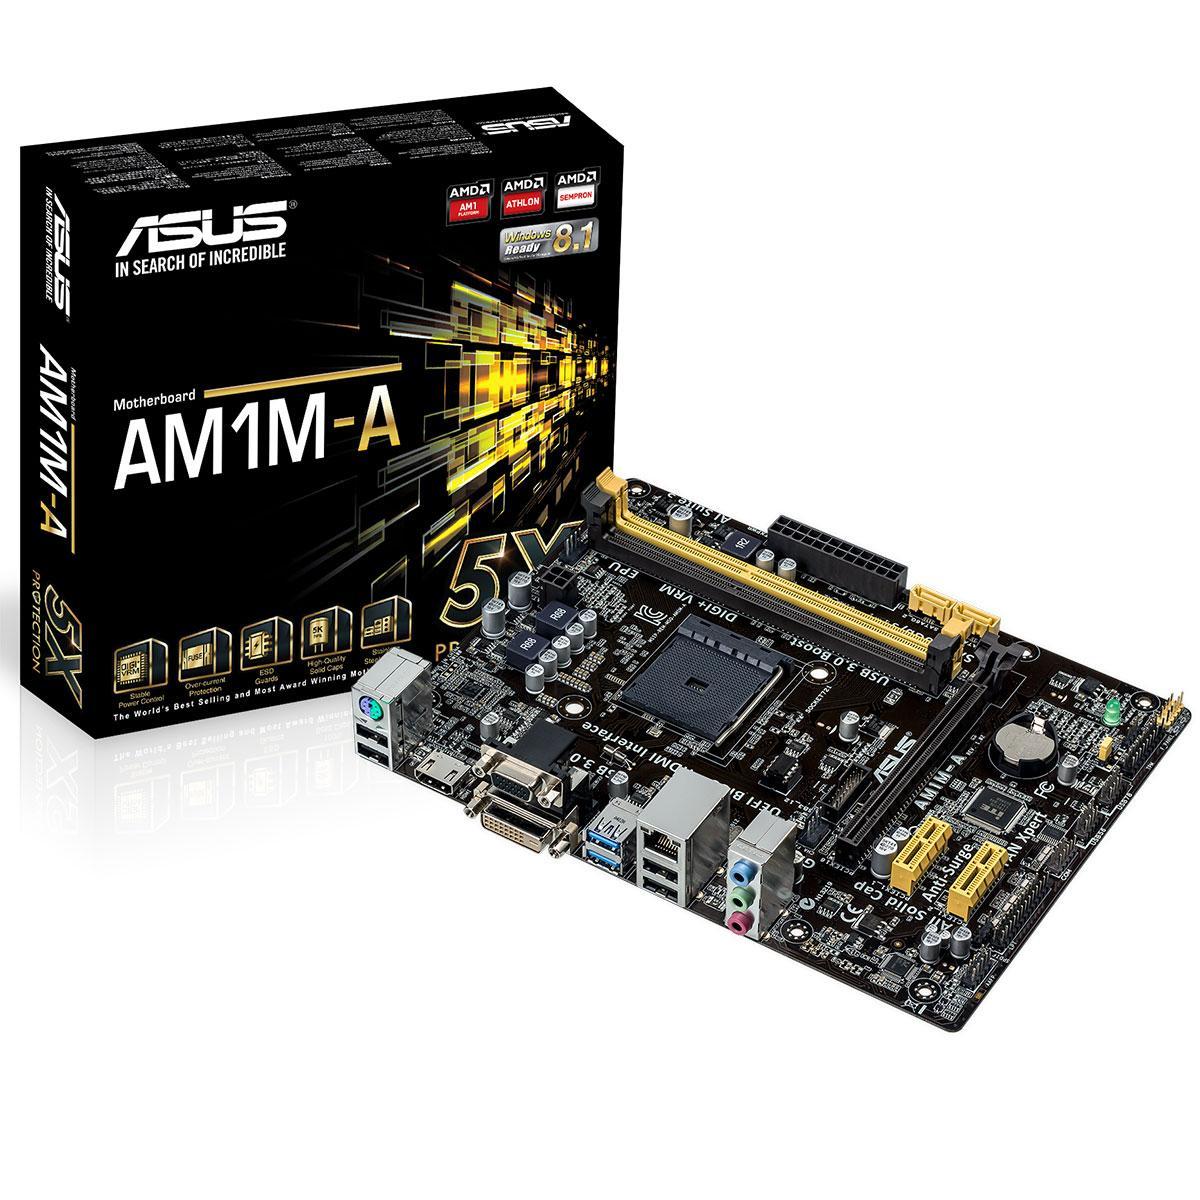 Asus AM1M-A/BR Micro ATX AM1